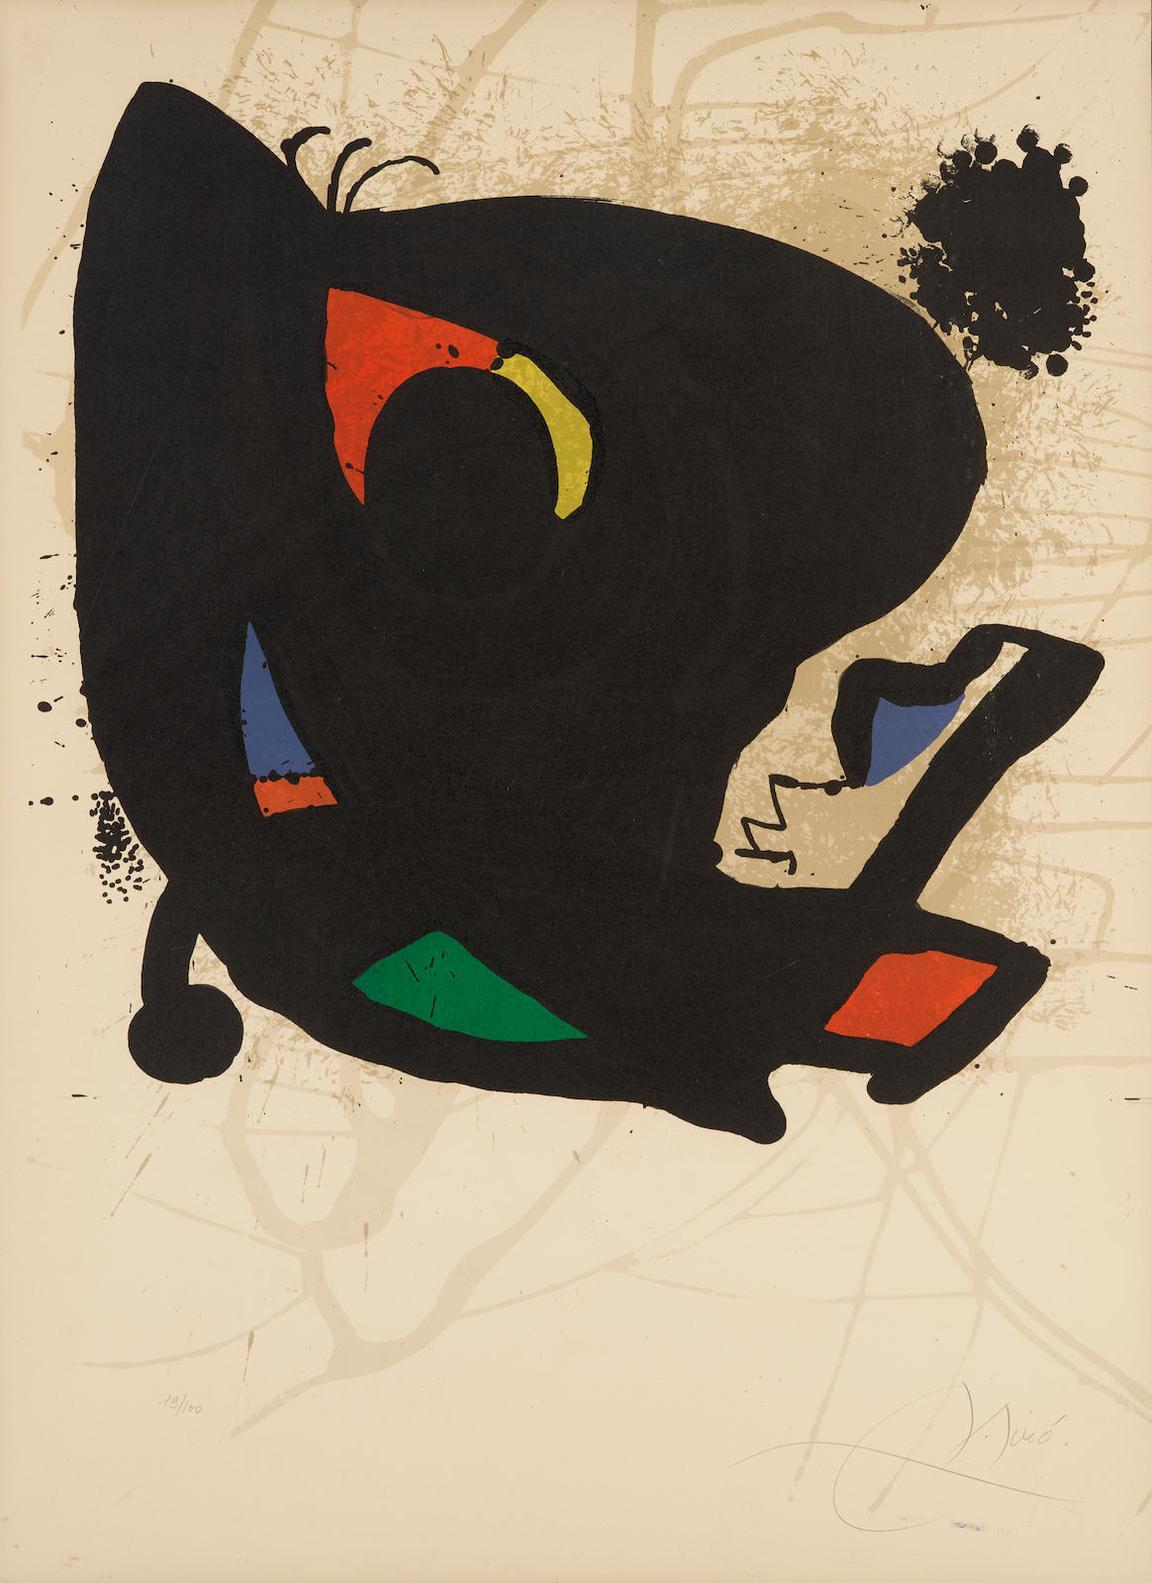 Joan Miro-Poster For Exhibition Miro Loeuvre Graphique (M. 947)-1974